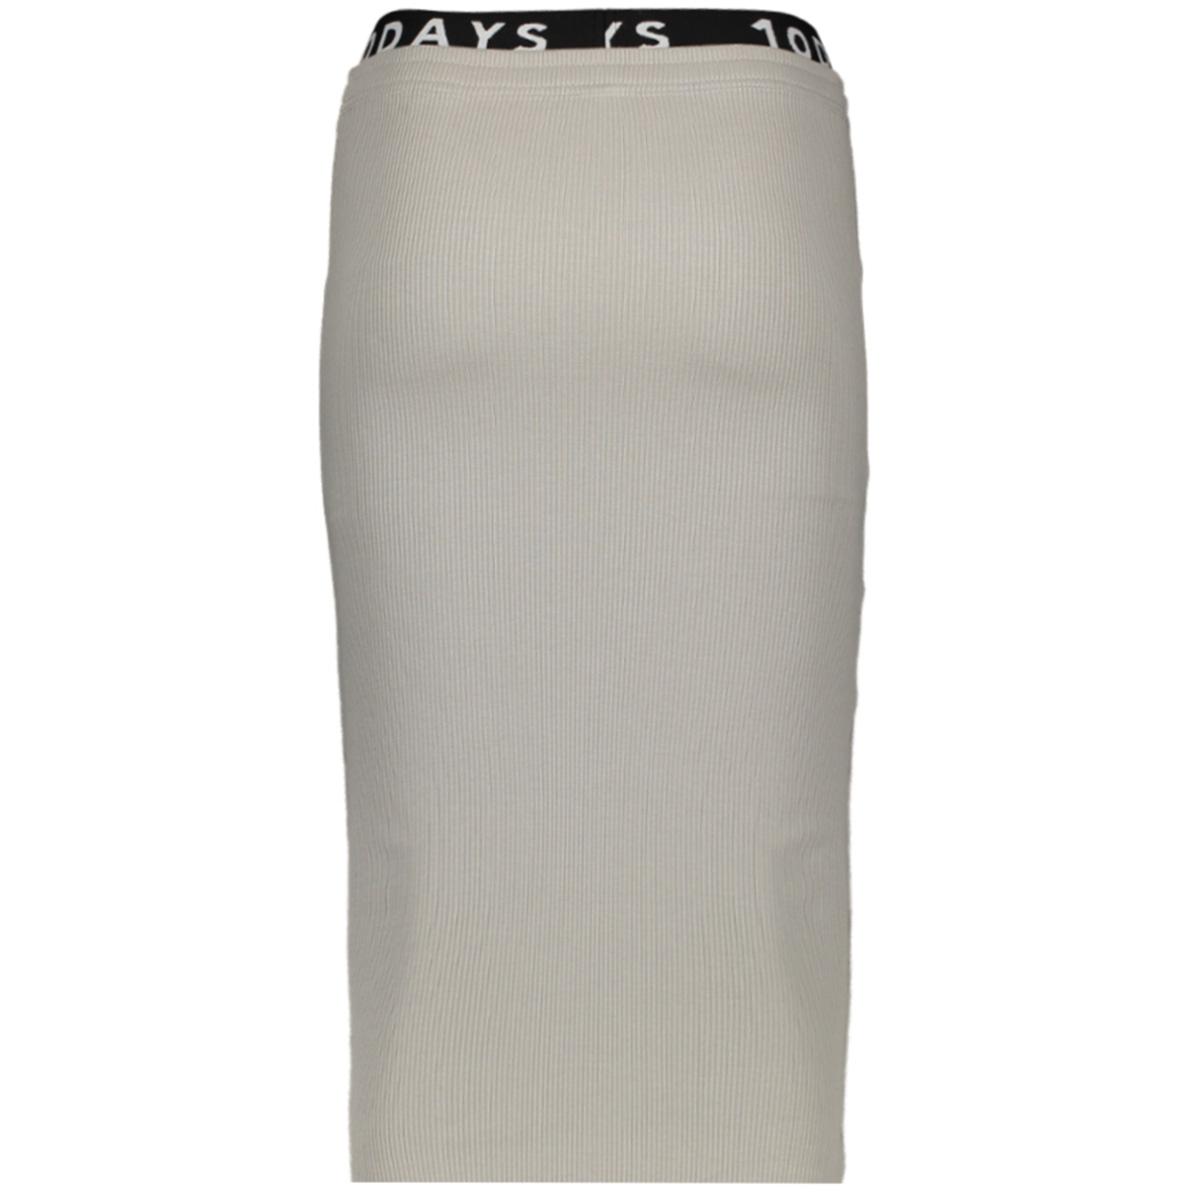 rib skirt 20 102 0201 10 days rok clay